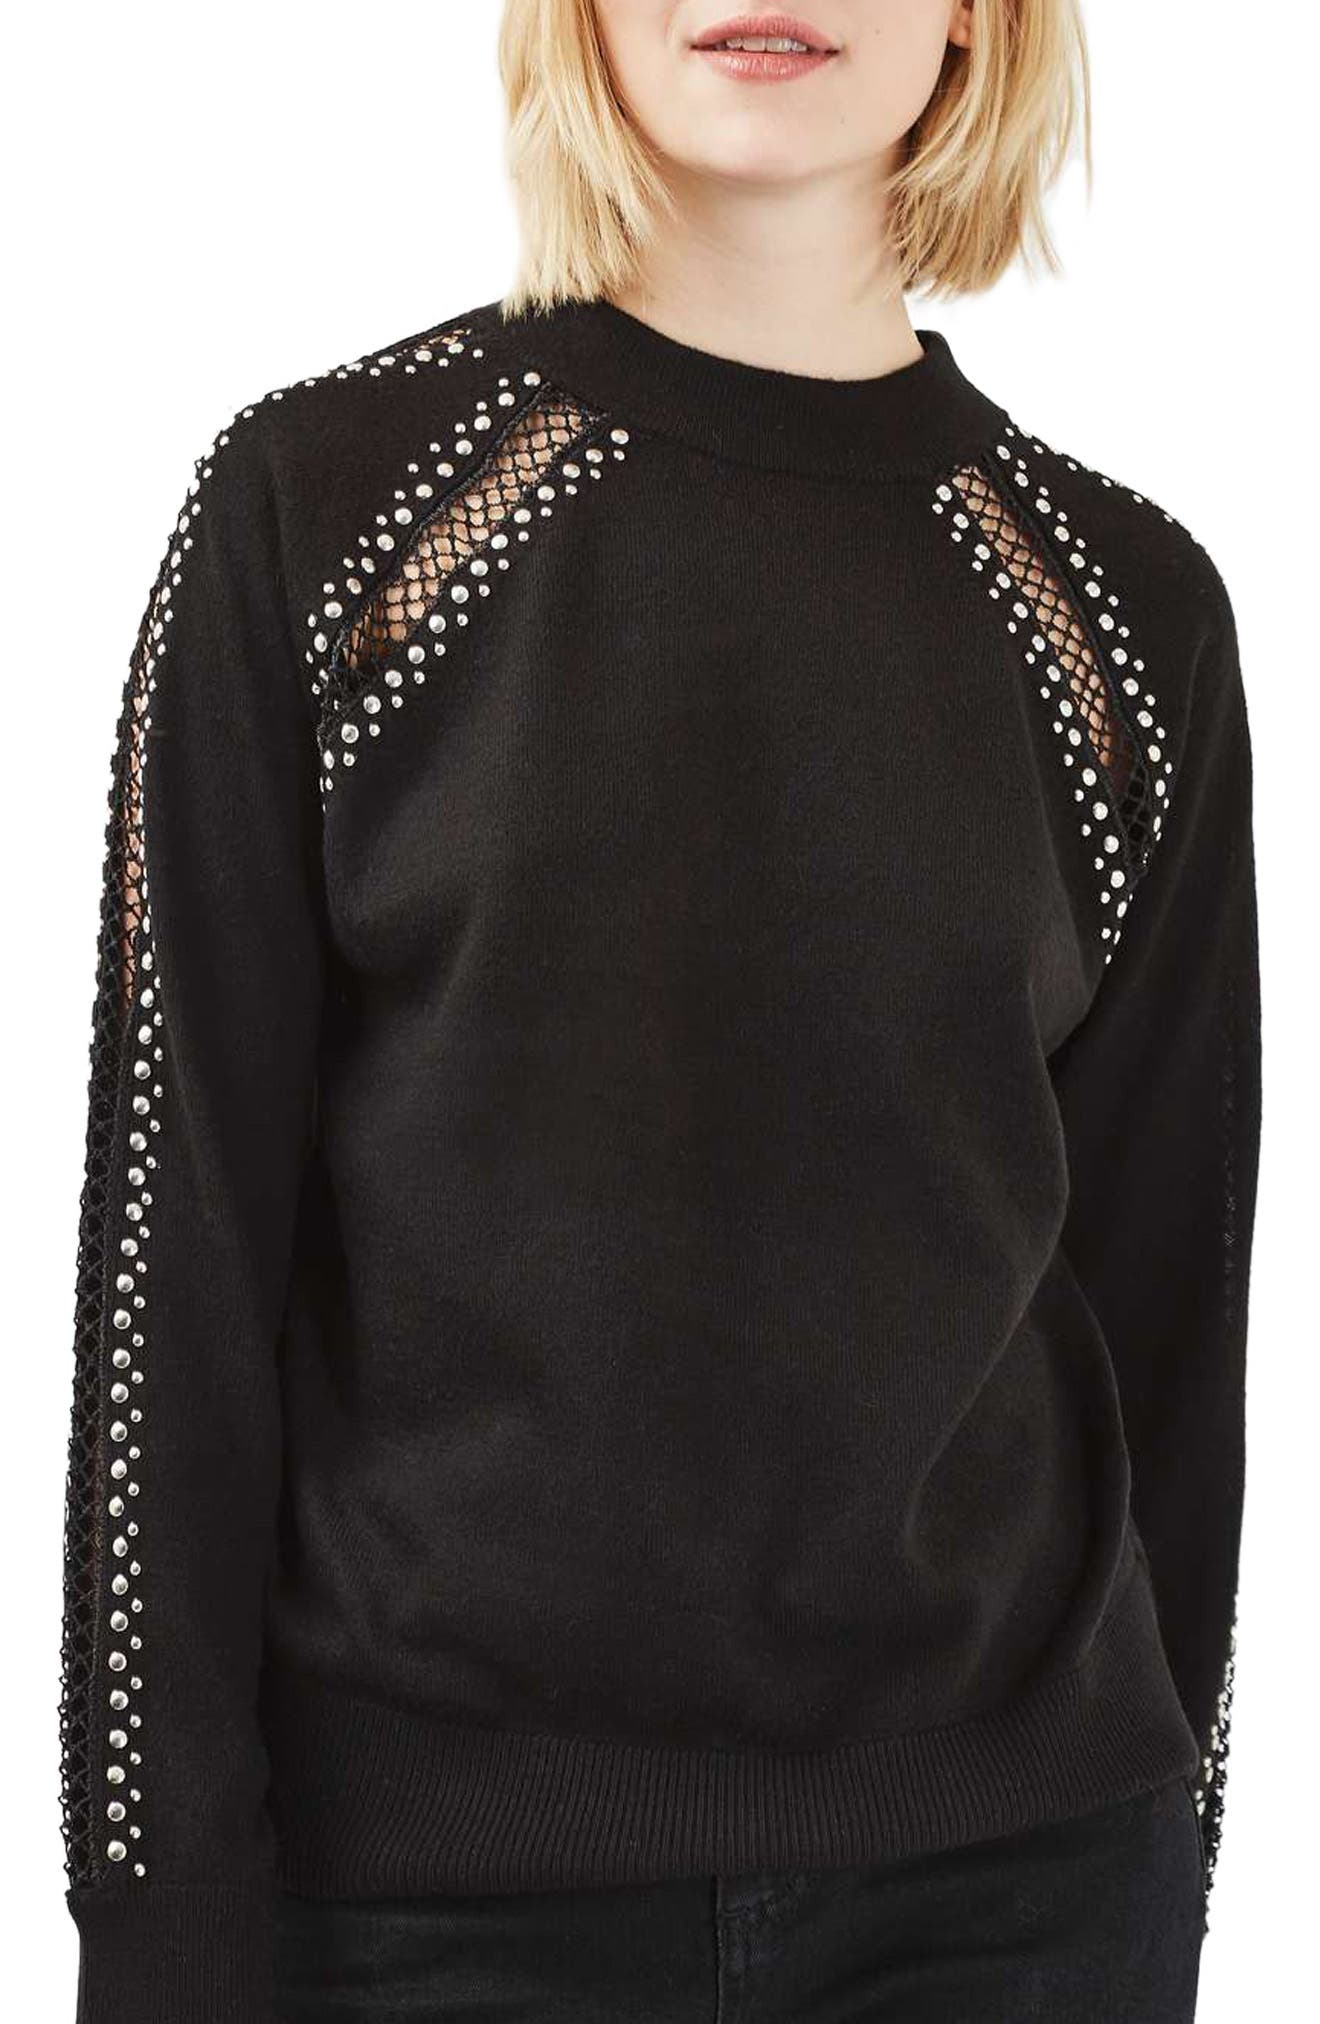 Alternate Image 1 Selected - Topshop Stud Lattice Sweater